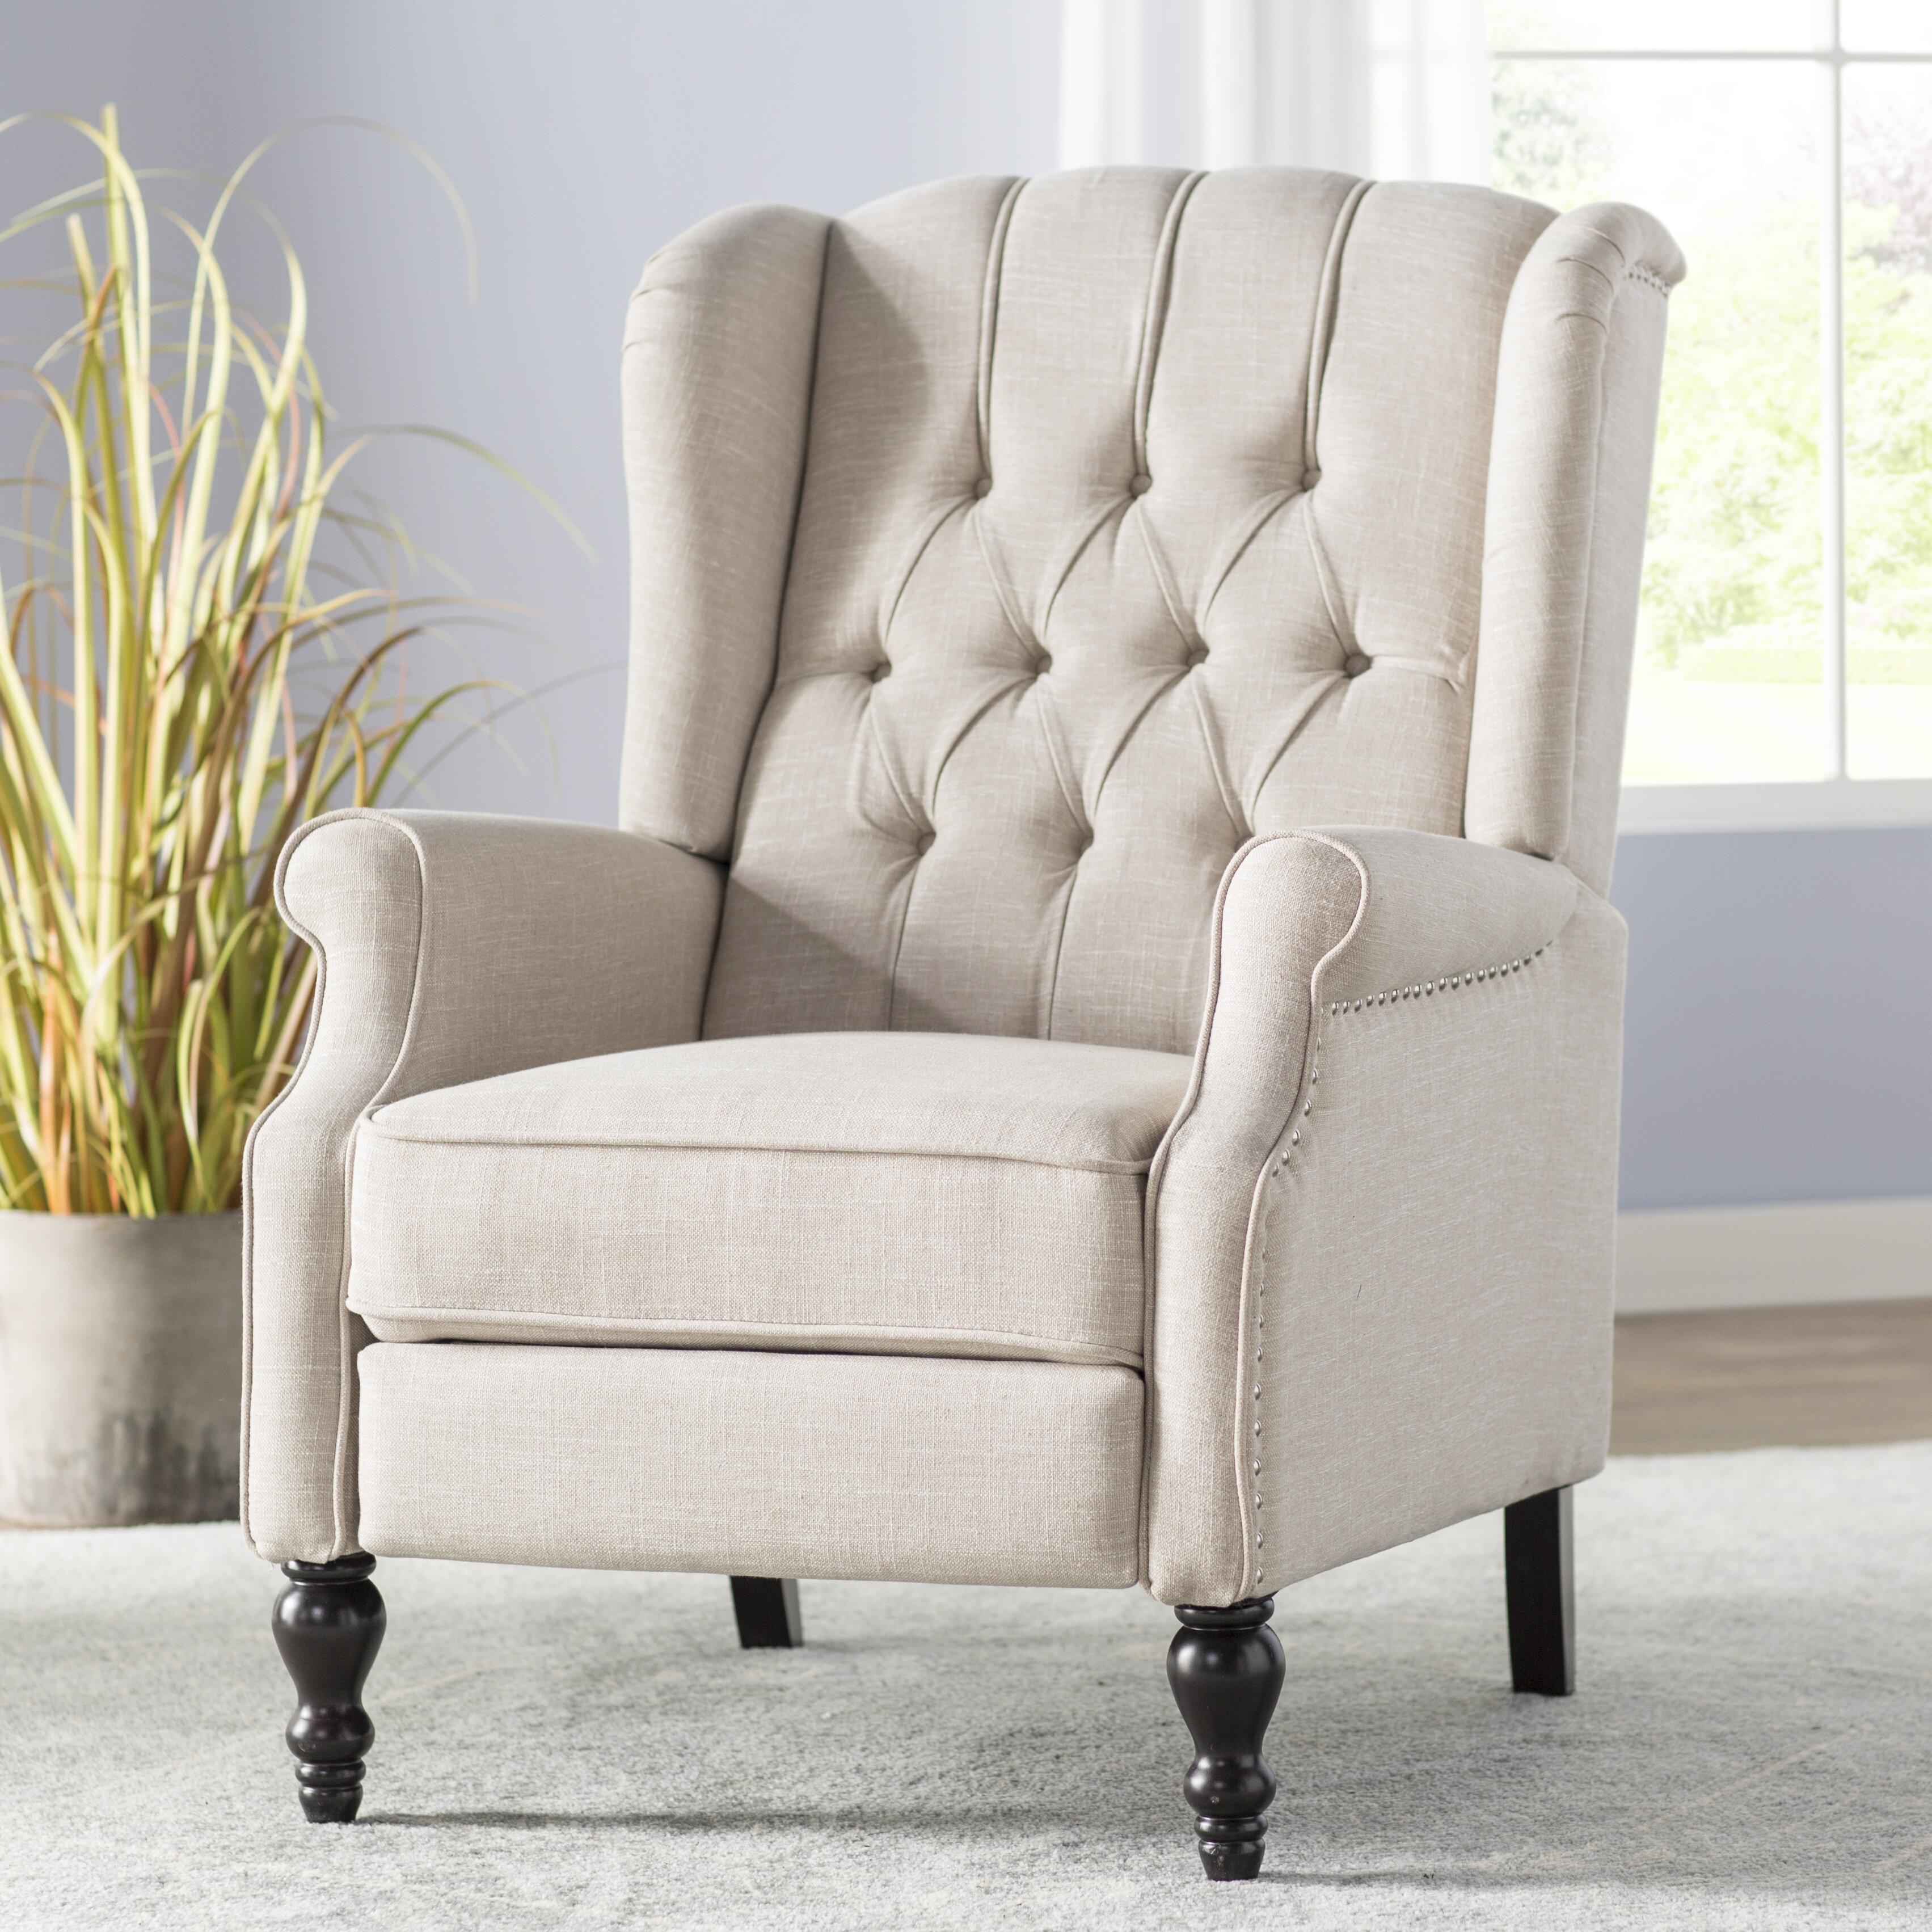 Andover mills leonie manual recliner reviews wayfair